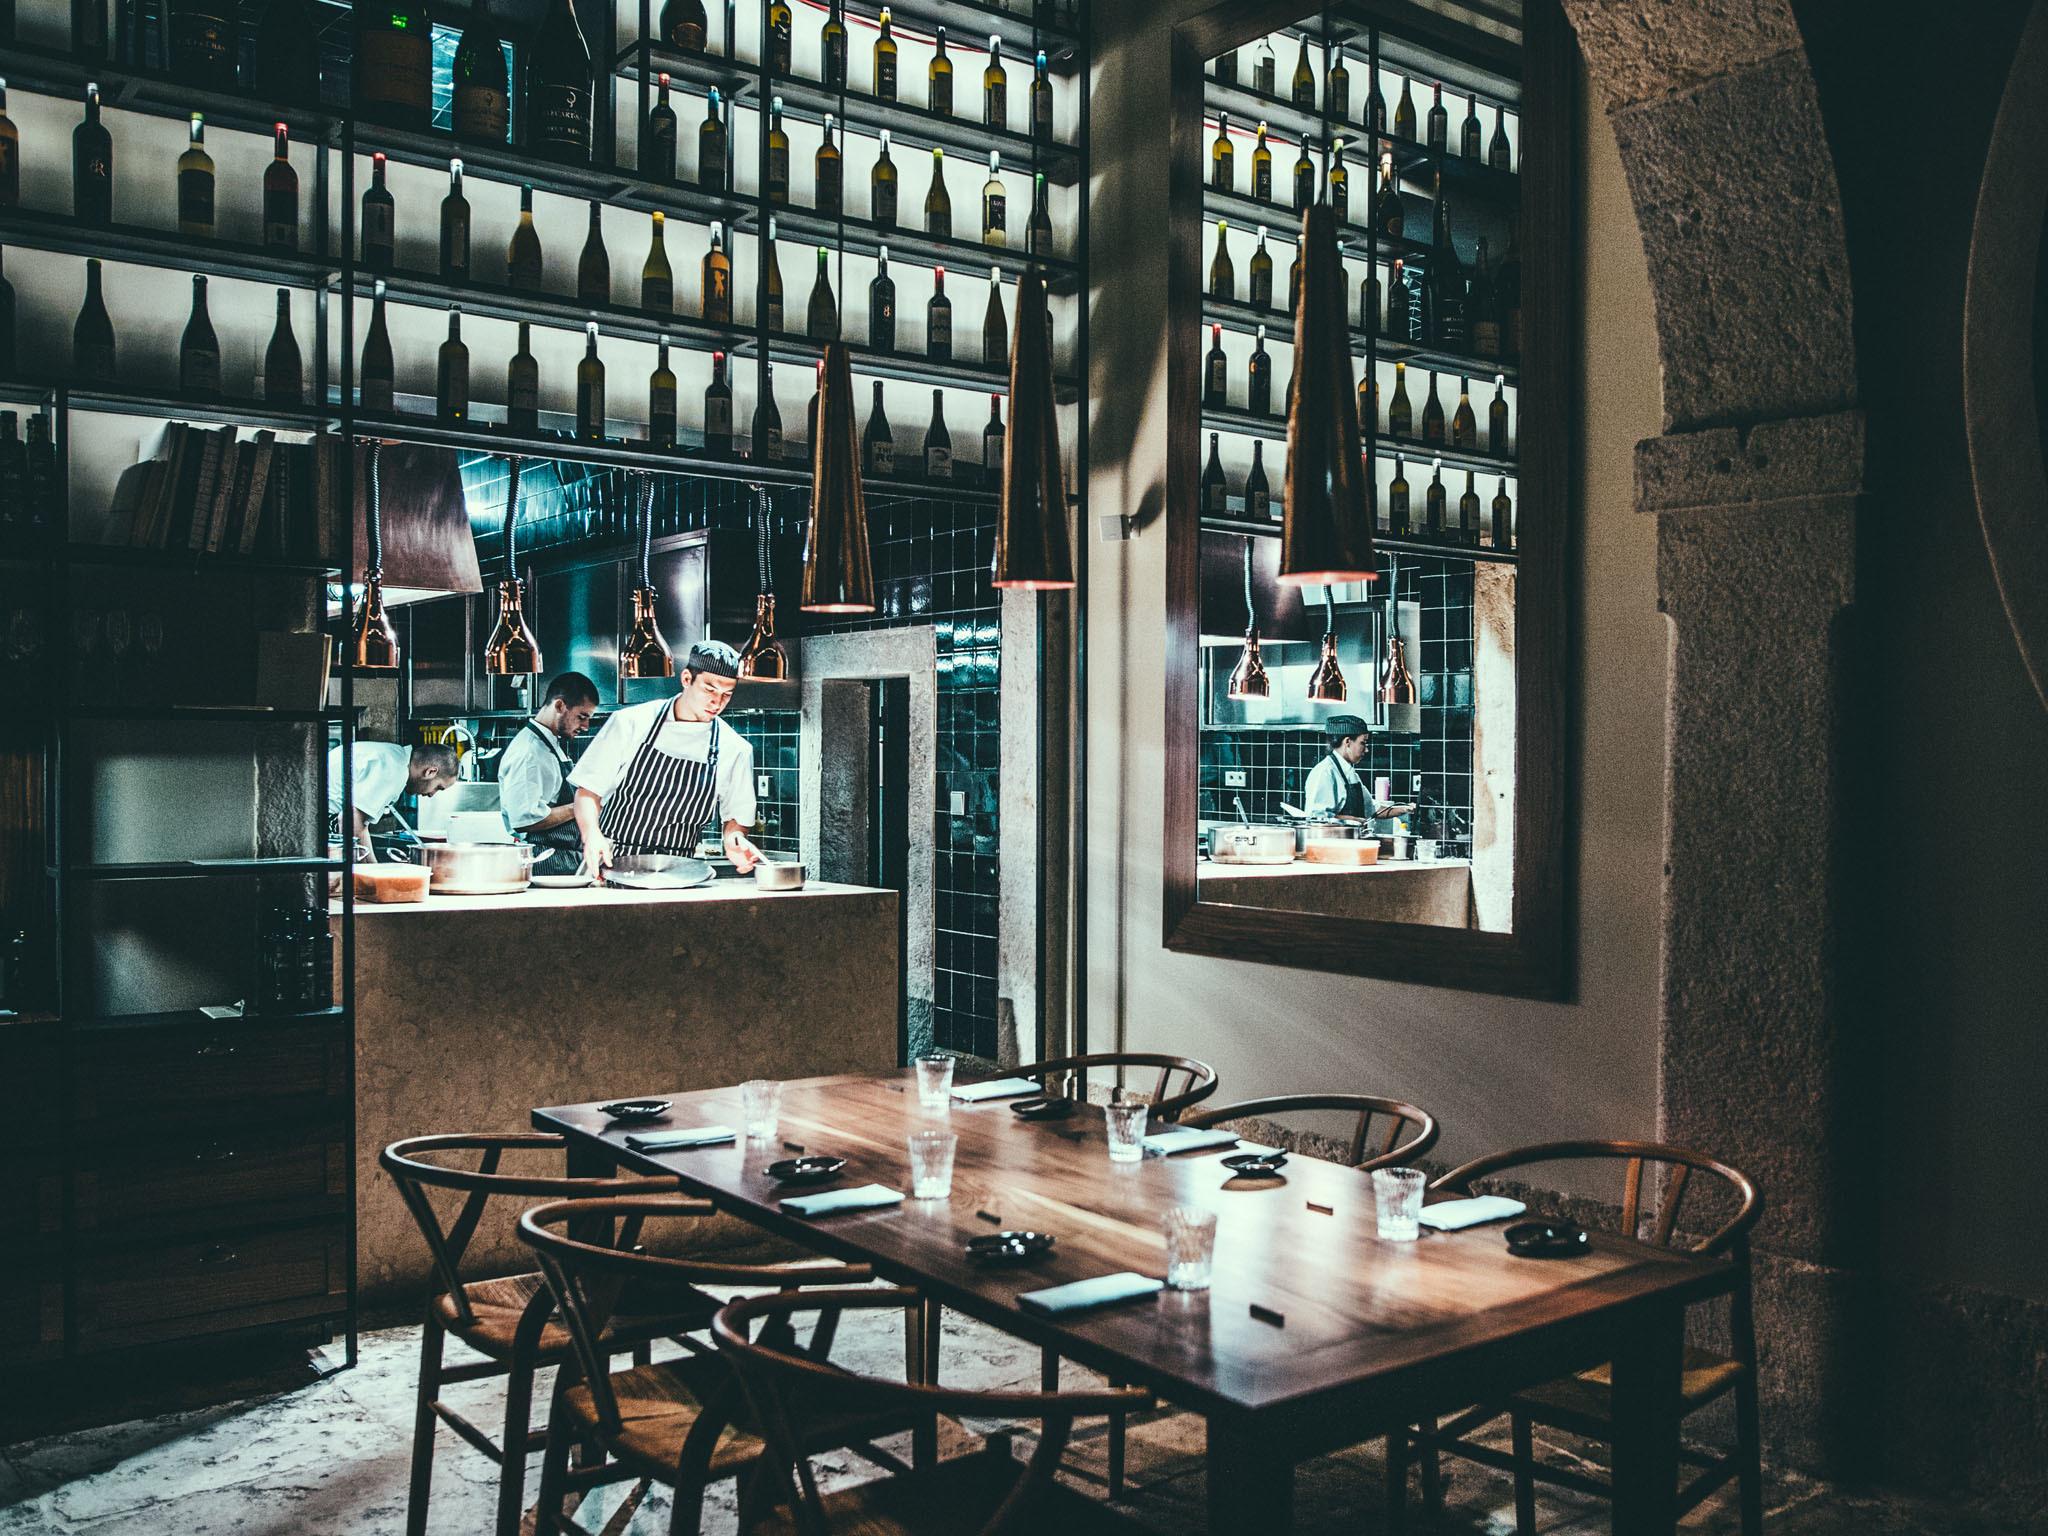 Best Lisbon restaurants – the top places to eat in Lisbon